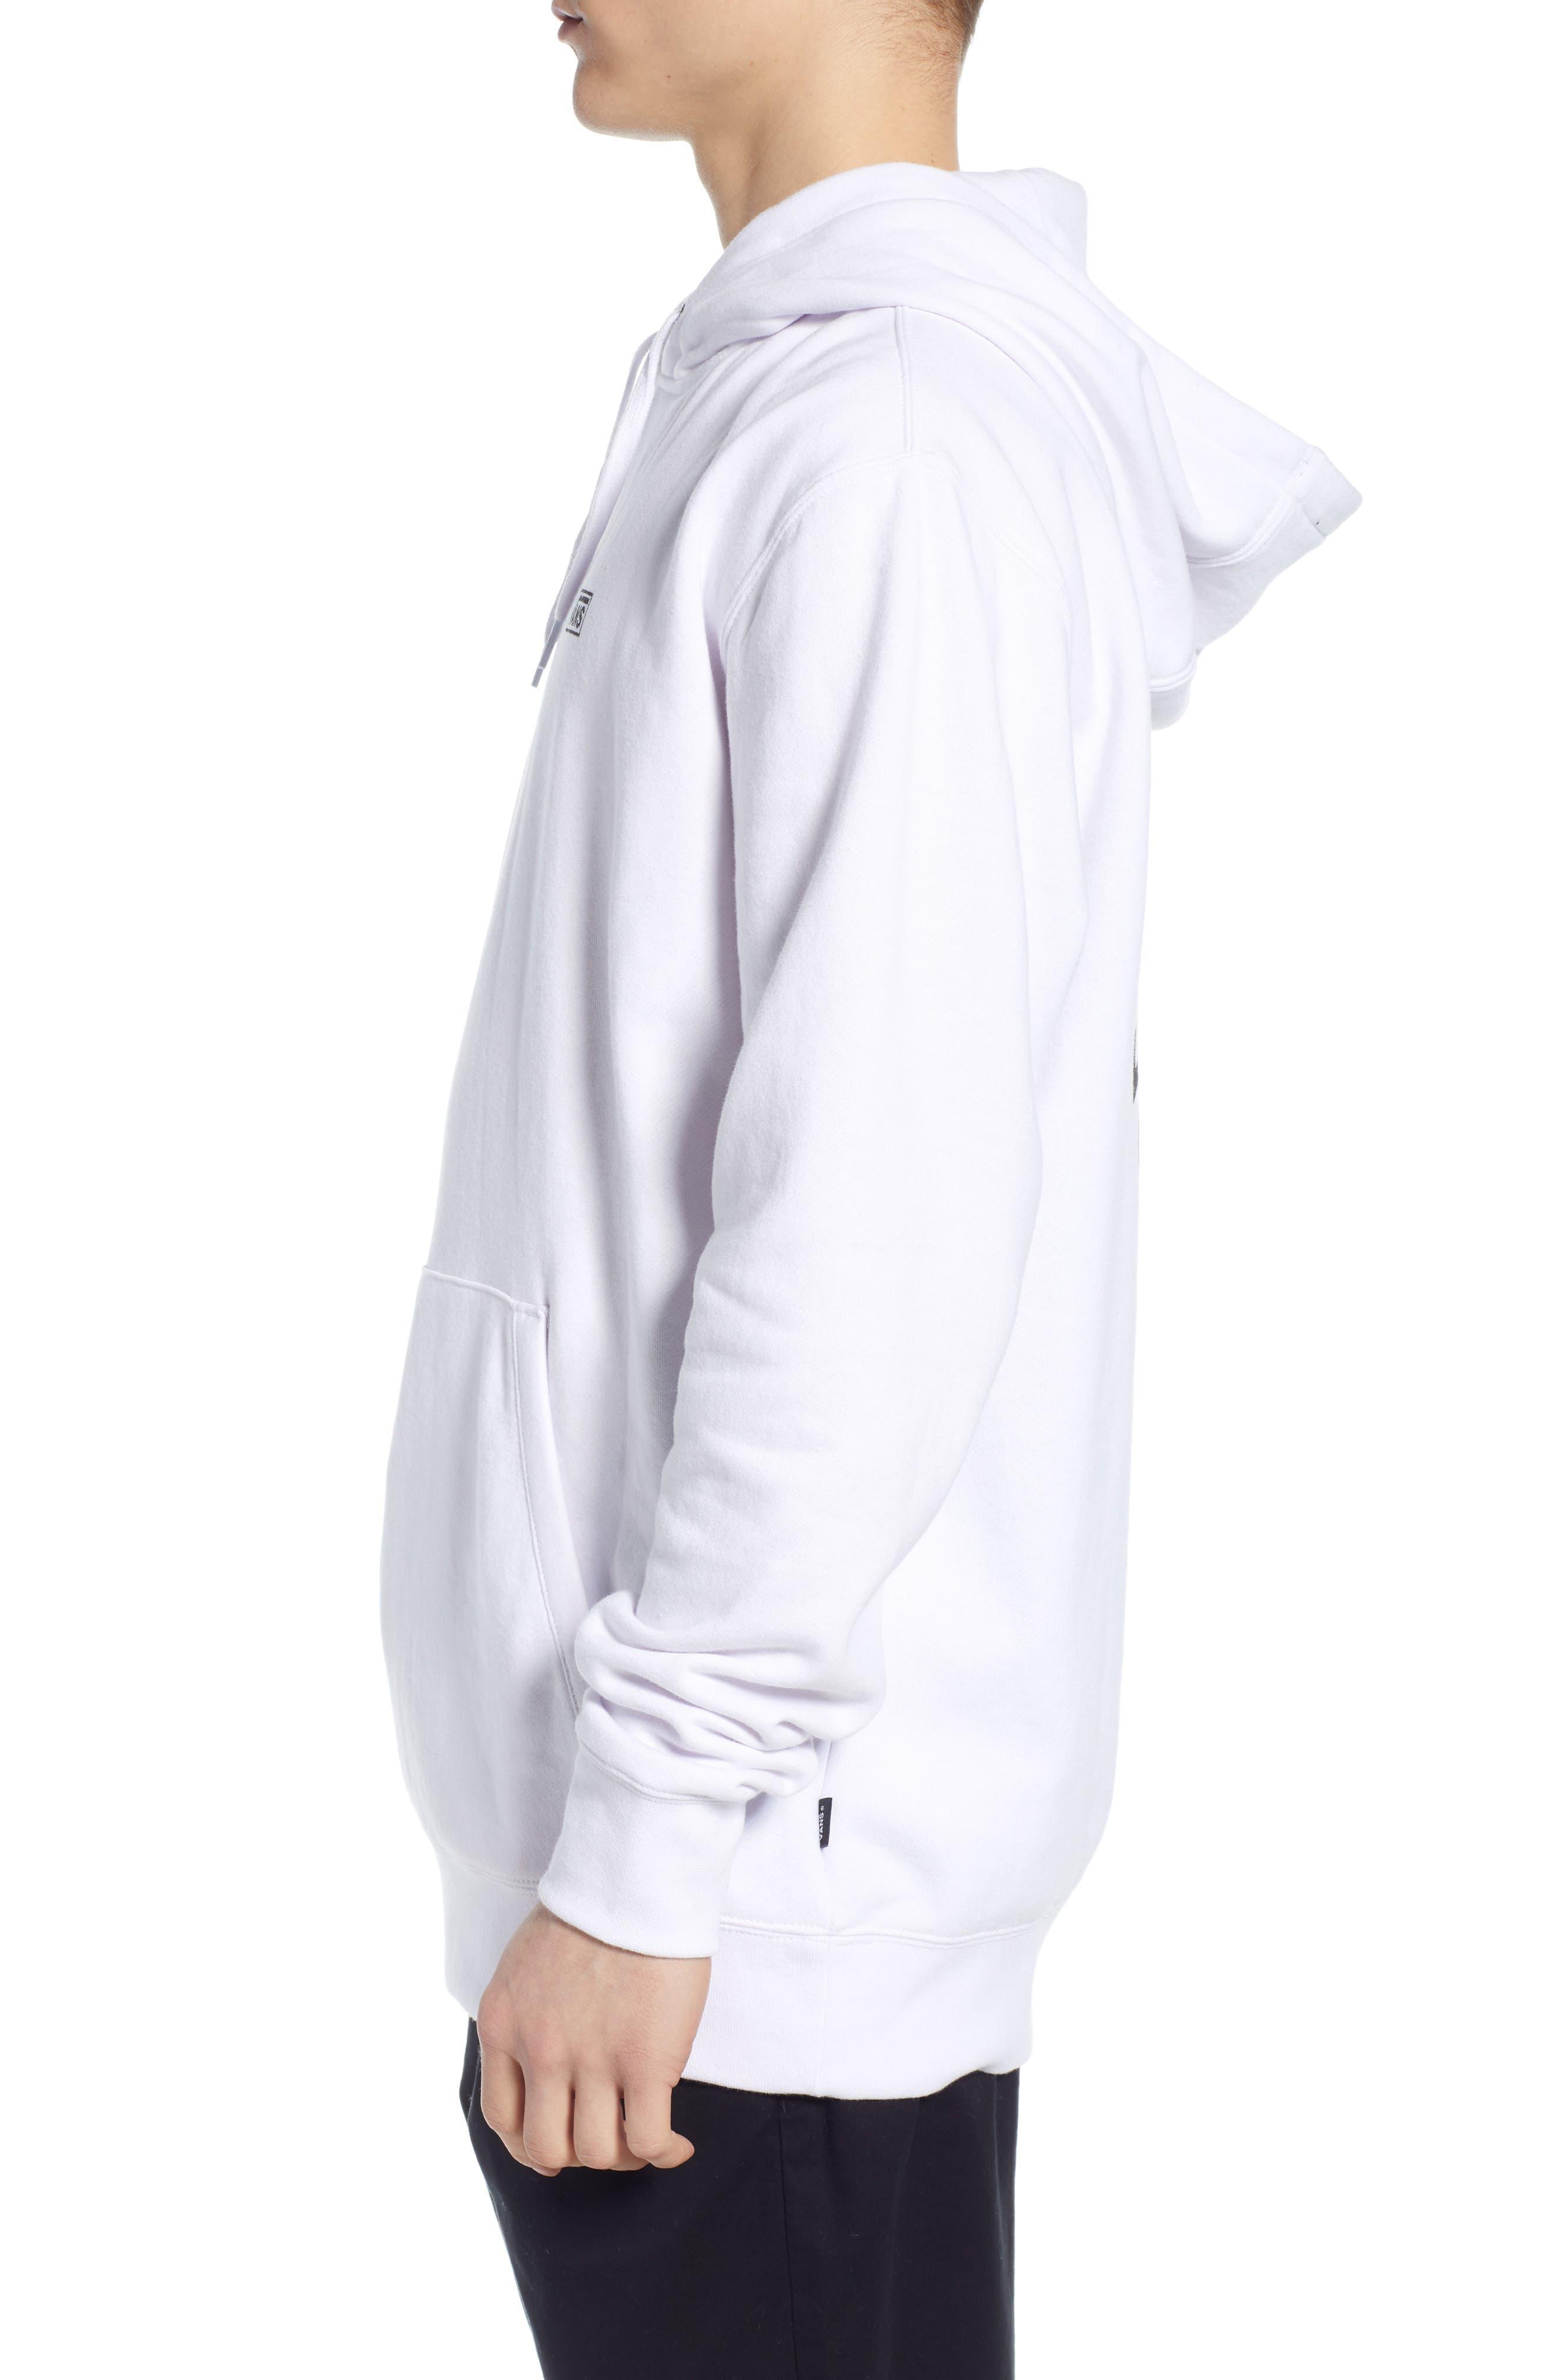 VANS, Off the Wall Distort Hooded Sweatshirt, Alternate thumbnail 4, color, WHITE